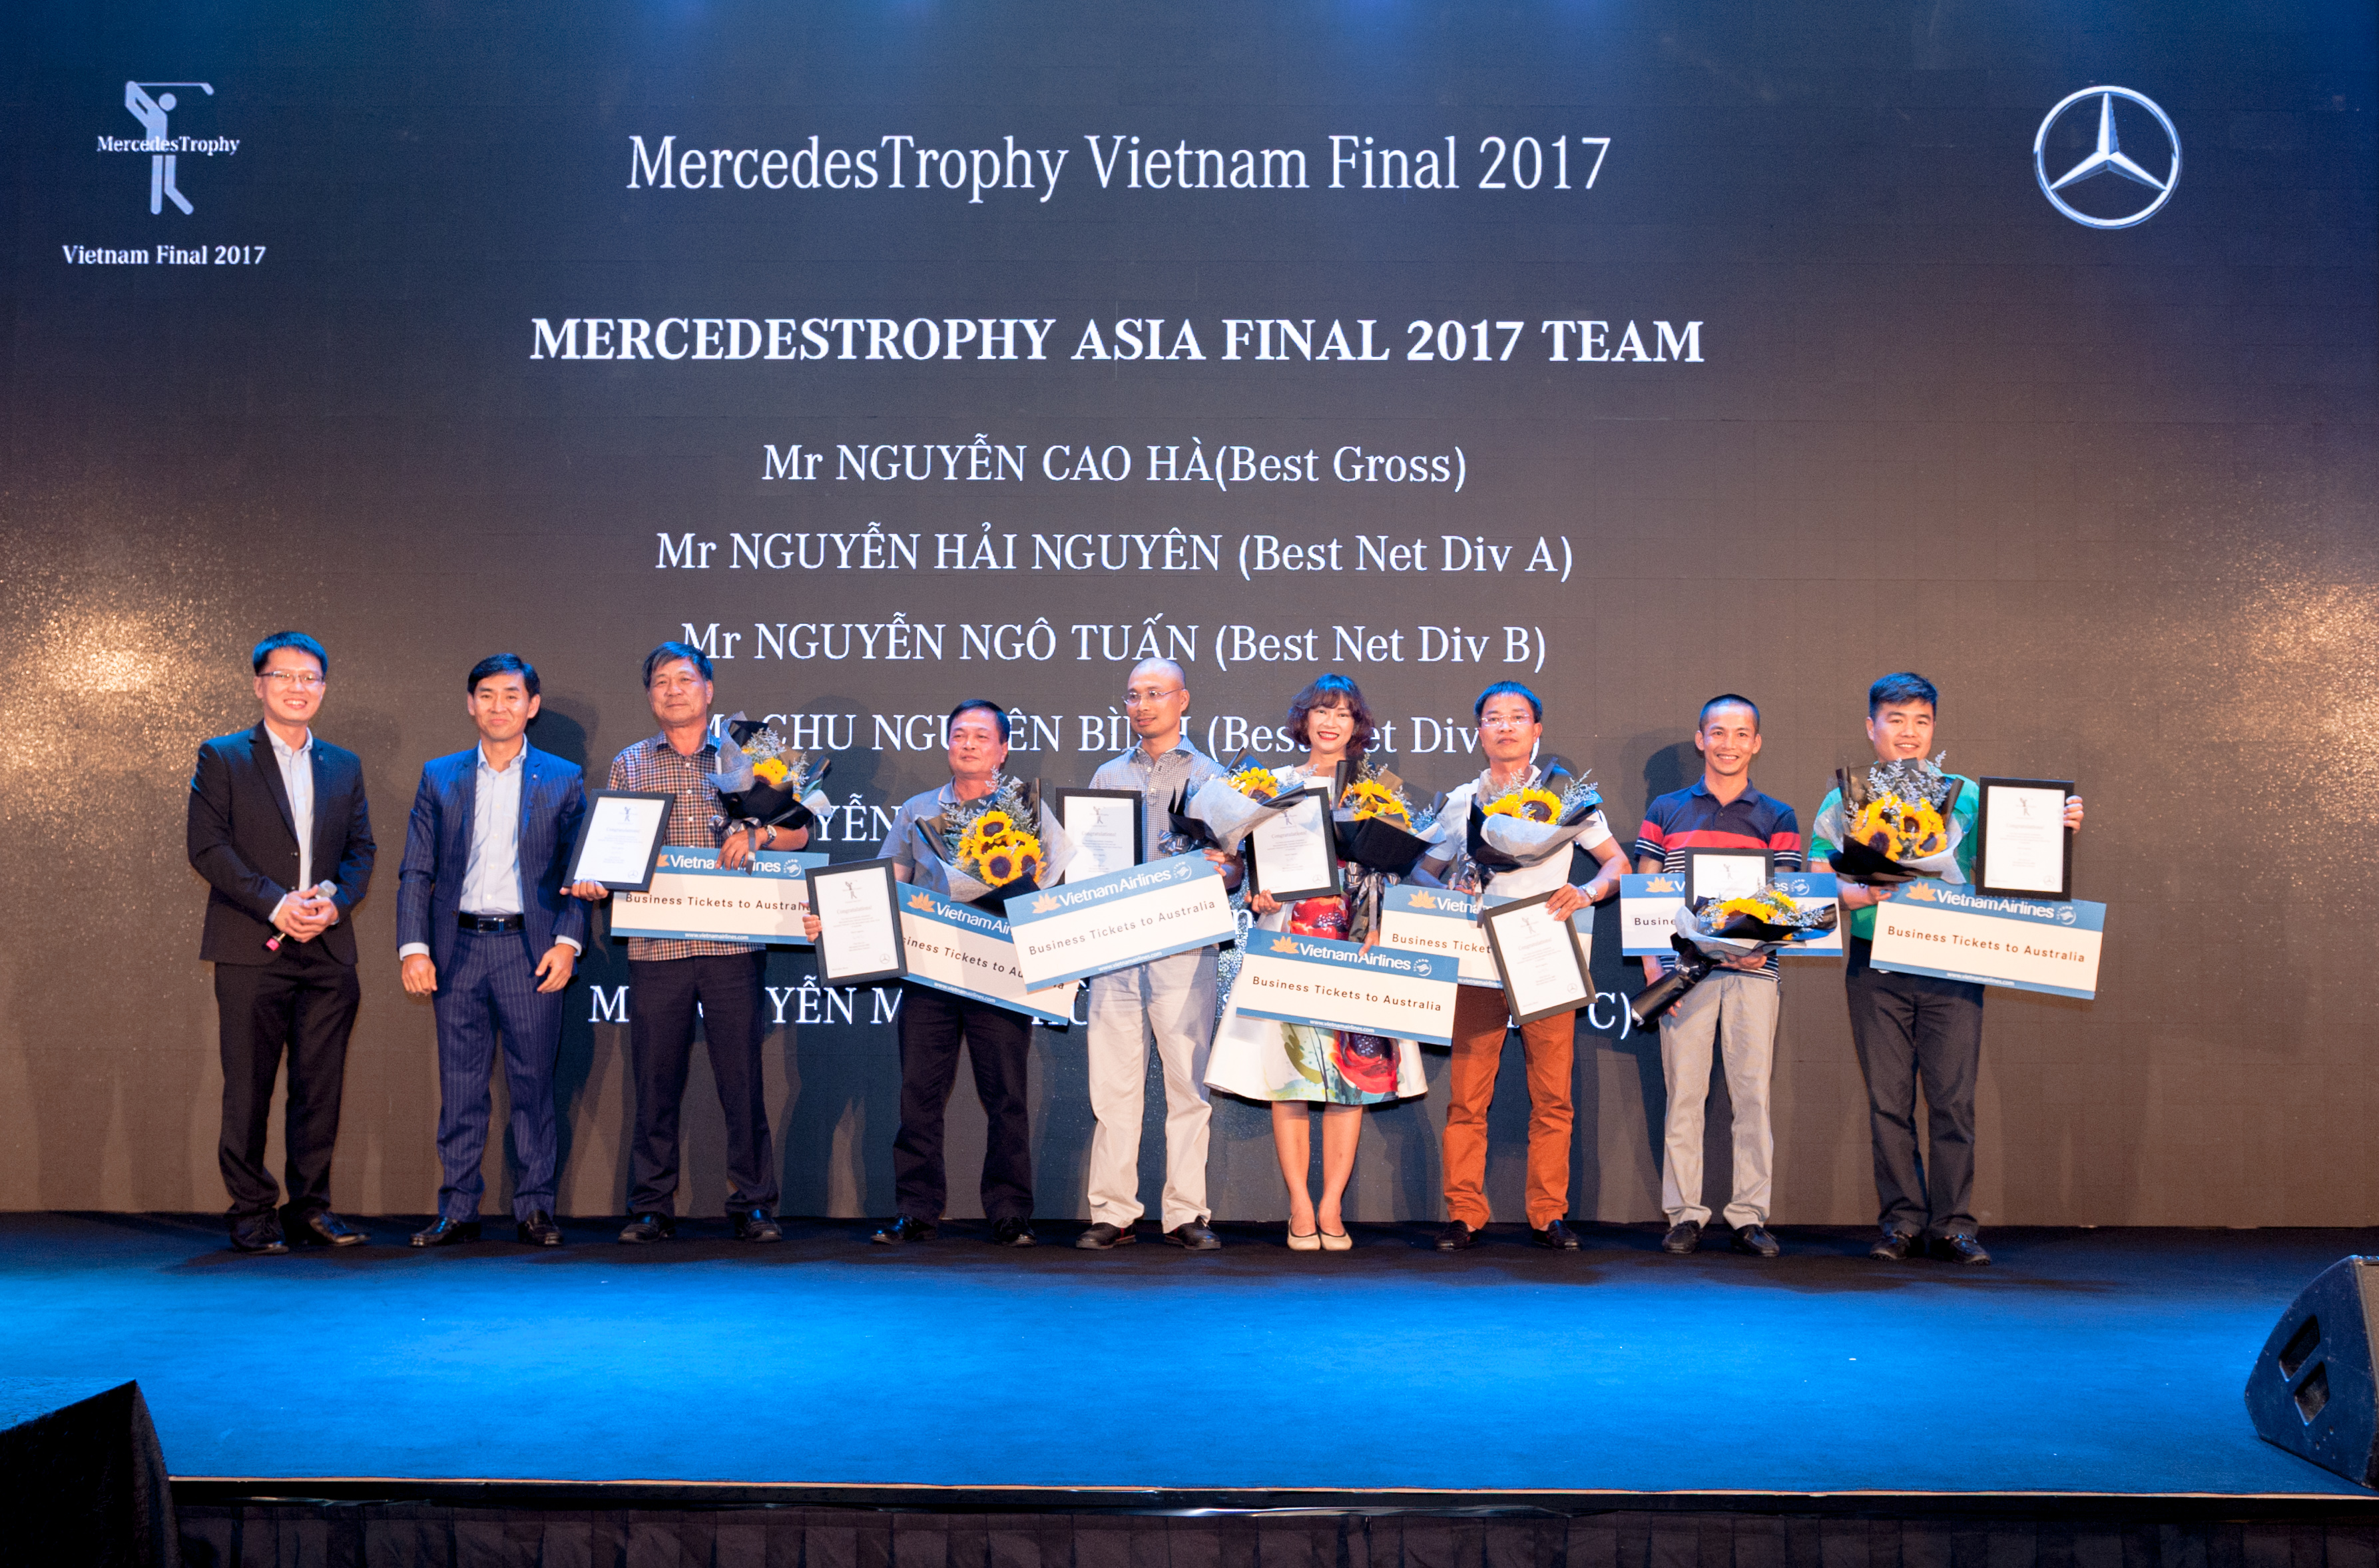 Asia Final 2017 Team